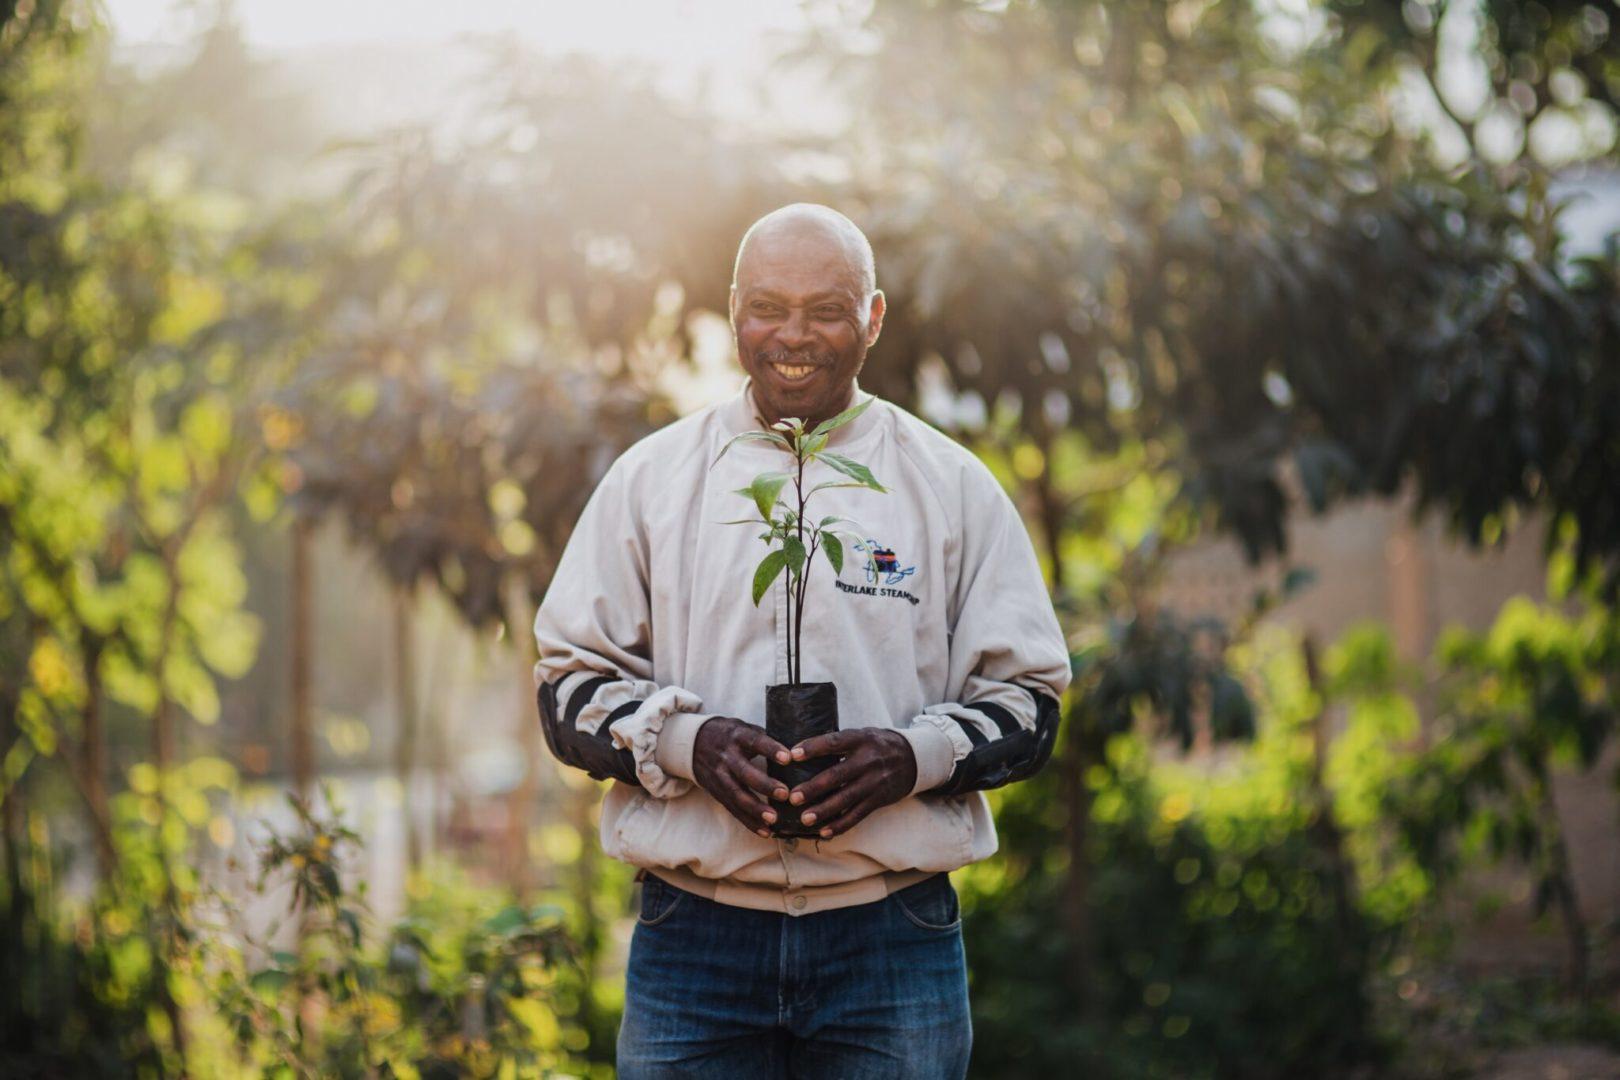 Wilner planting a tree